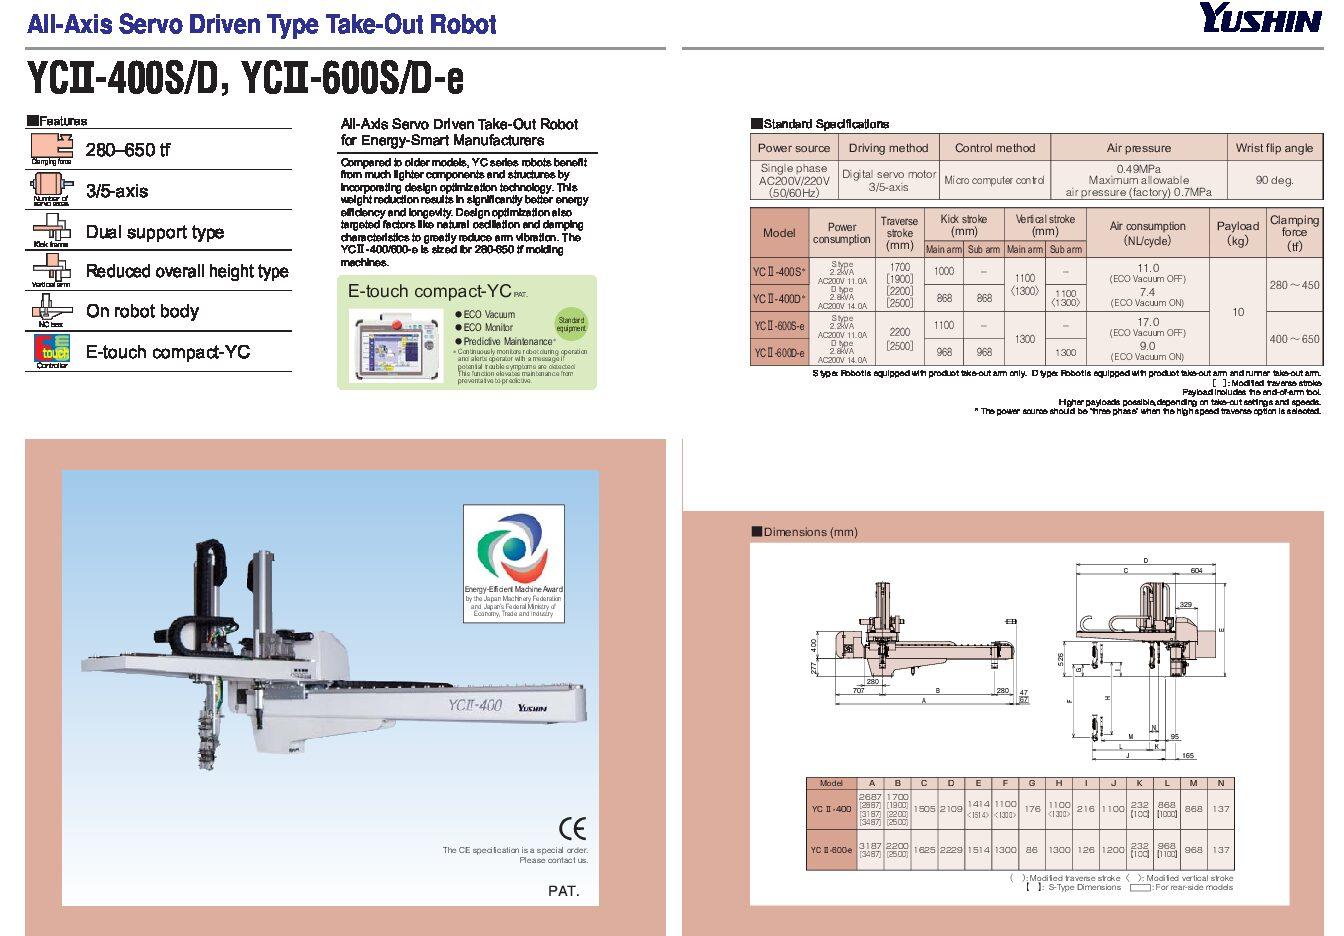 yc2 400sd600sde en pdf